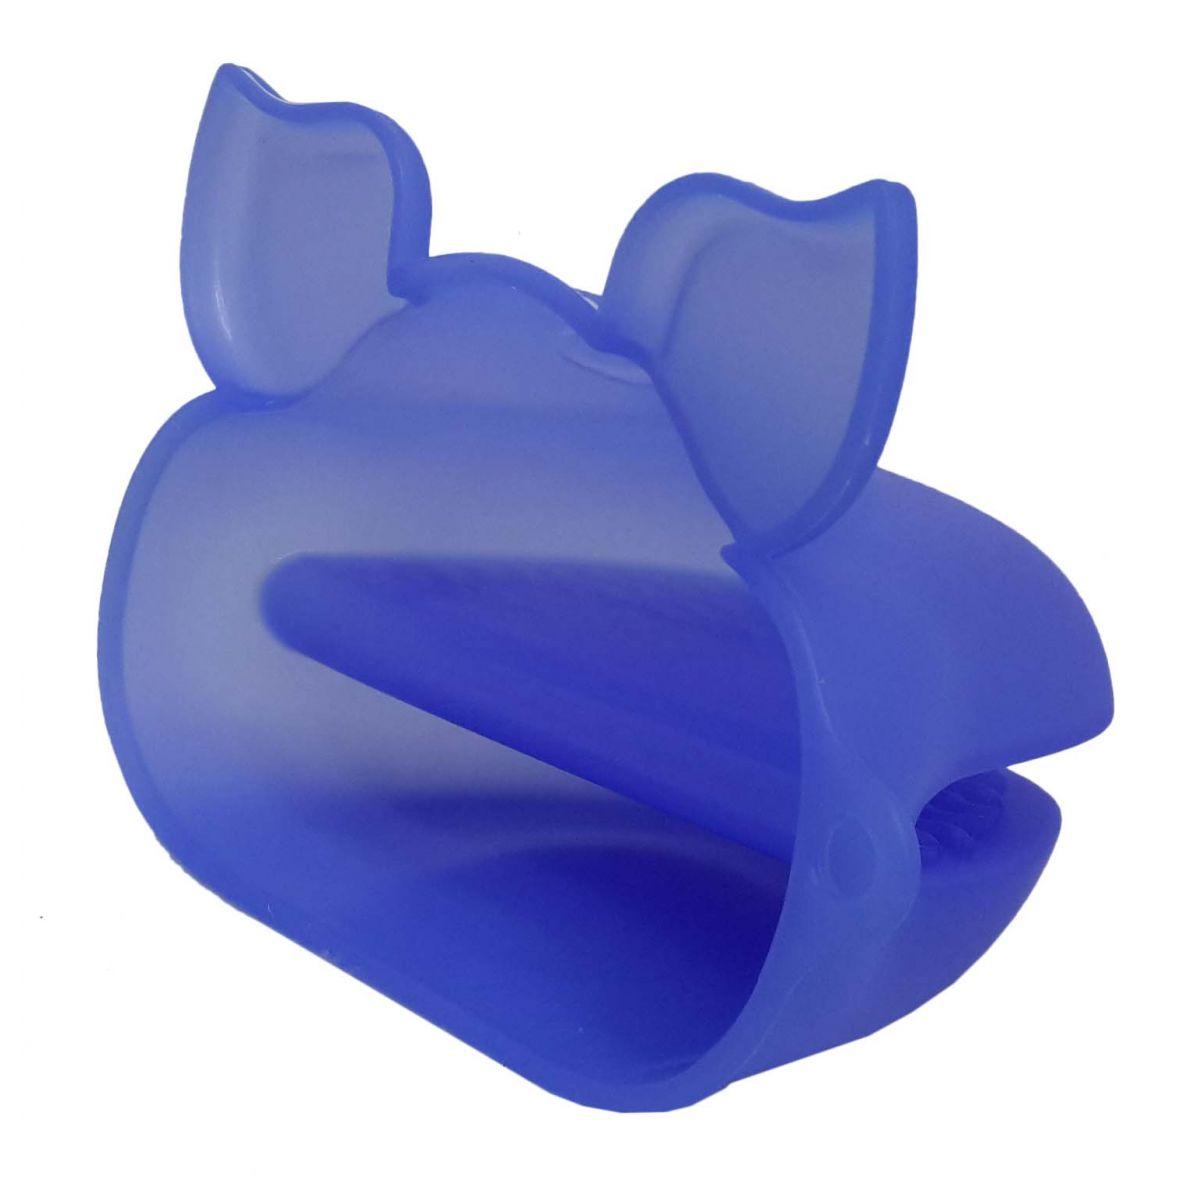 Kit 2 Luvas Termica De Silicone Pegador Fogao Forno Cozinha Par Azul Escuro (sili-8)